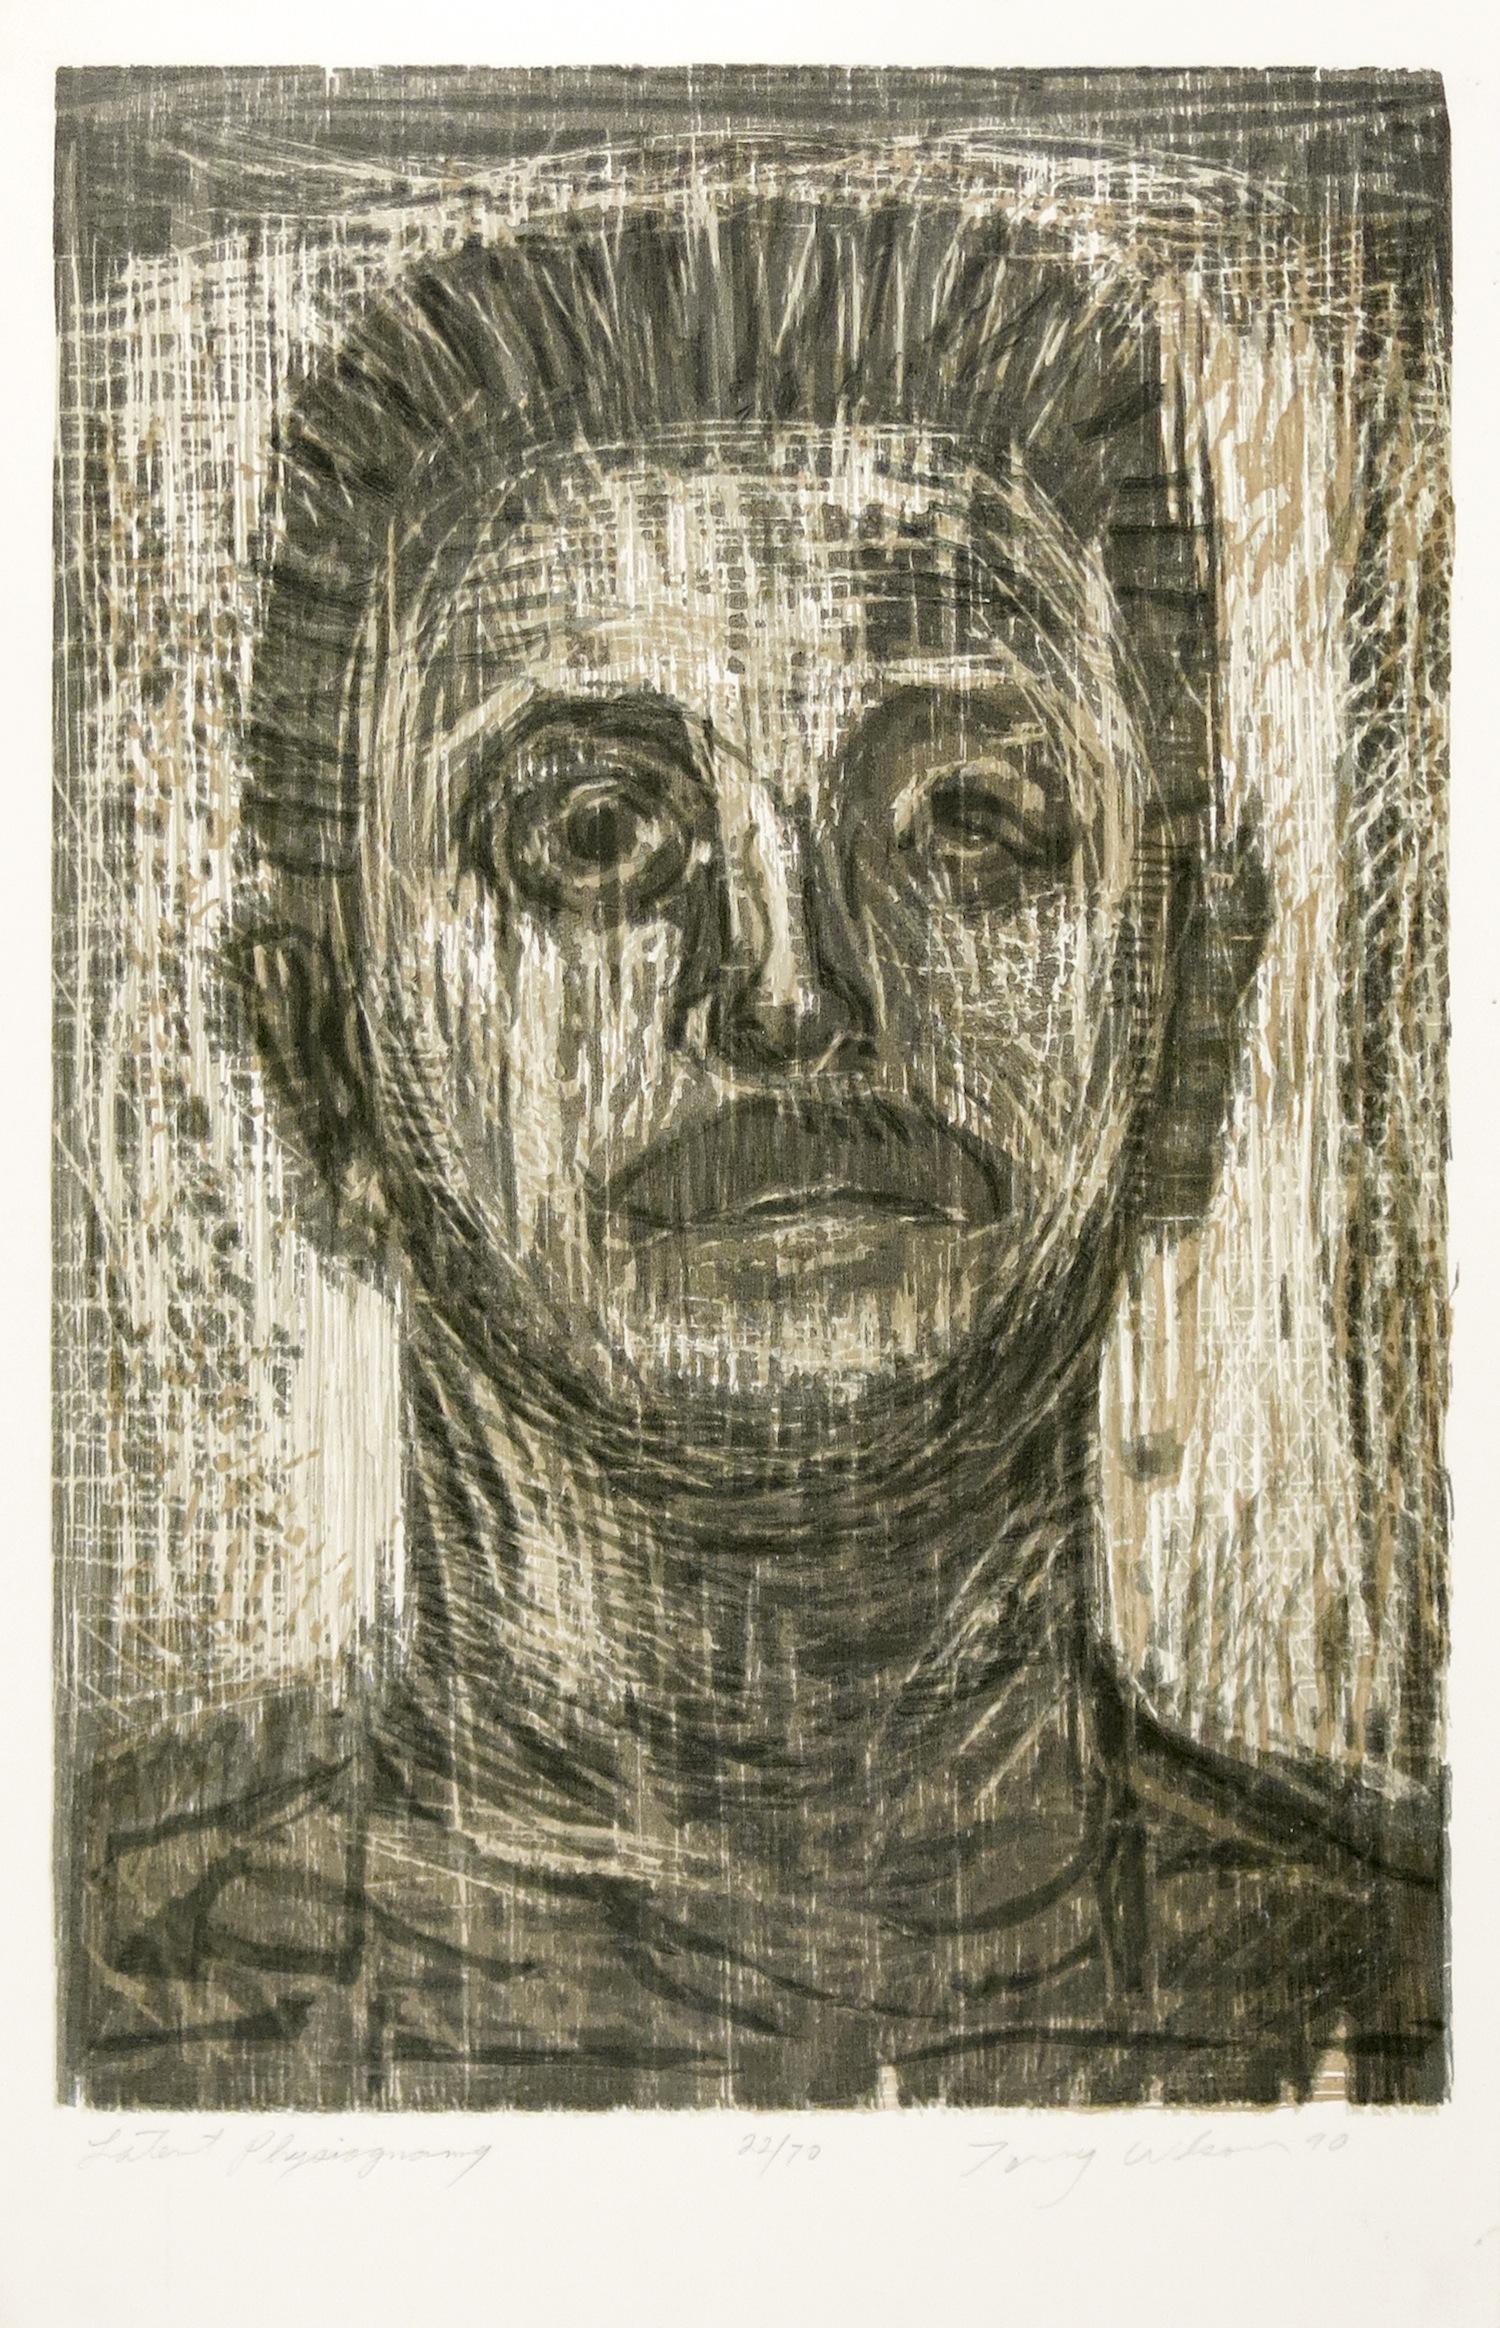 TONY WILSON  Latent Physiognomy , 1990 Woodcut and linocut